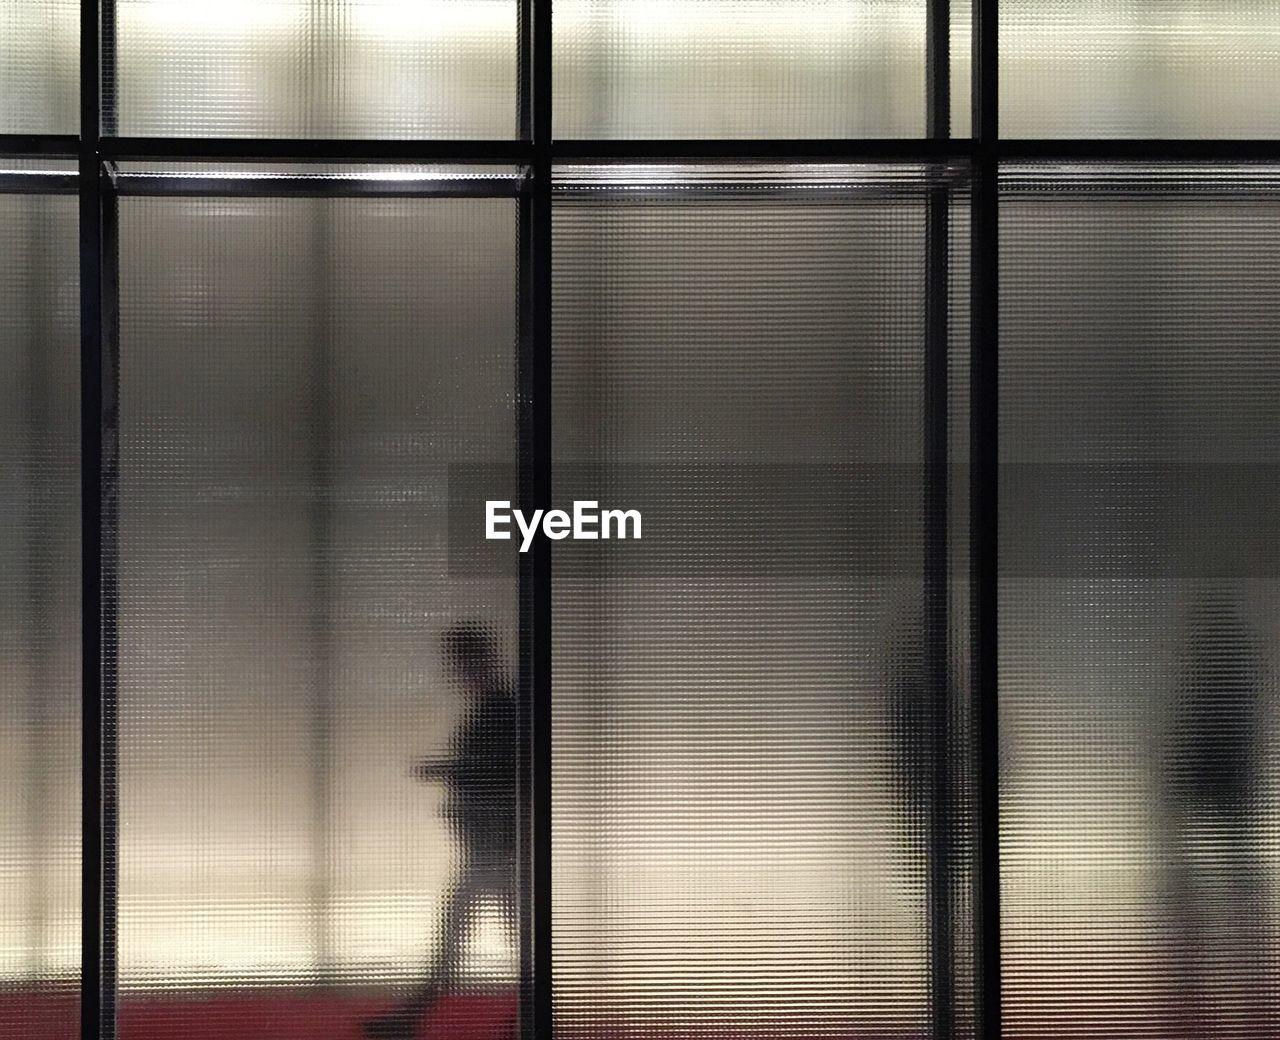 People Seen Through Translucent Glass